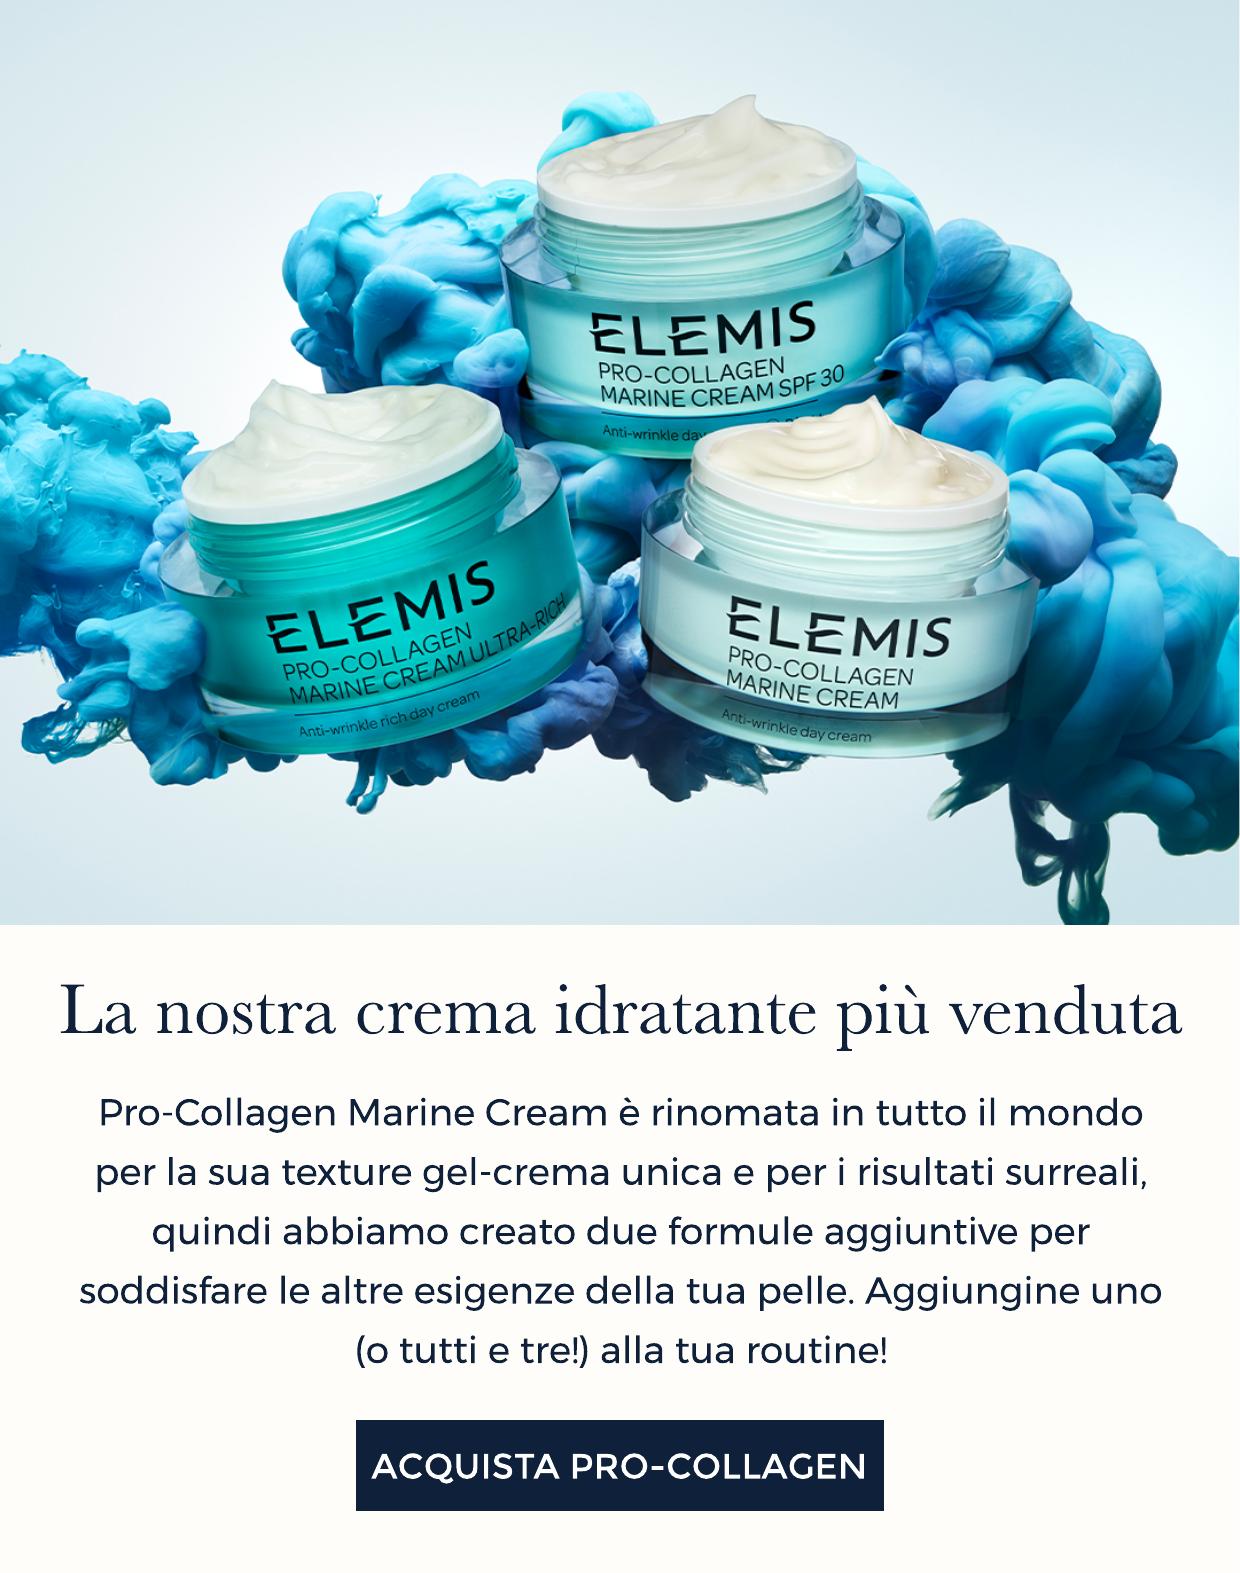 Crema pro-collagen